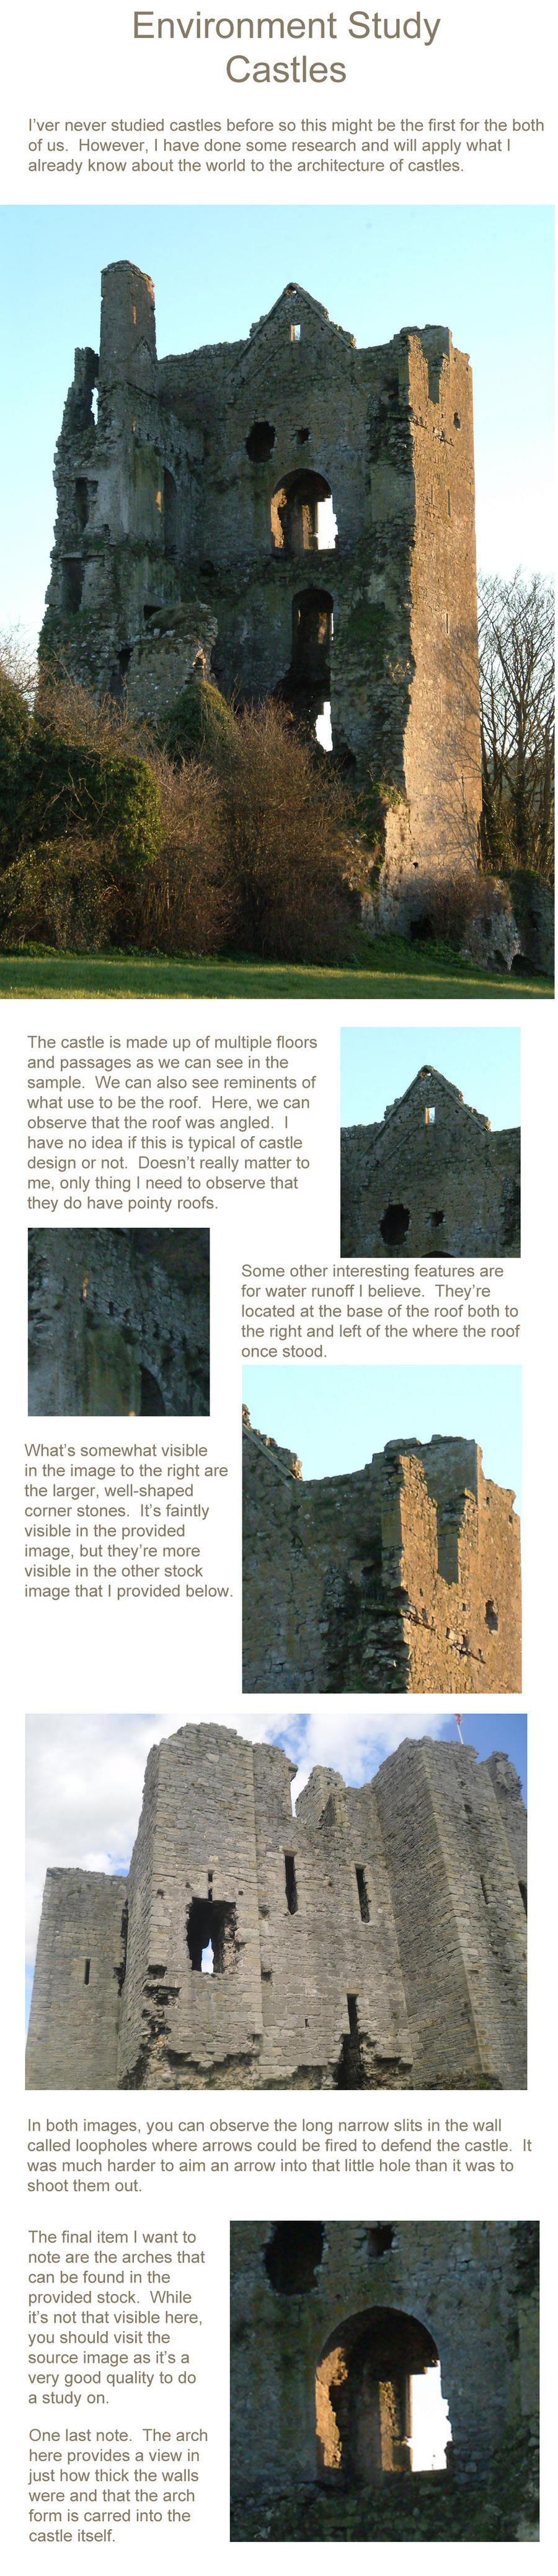 Environment Study: Castles by jjpeabody